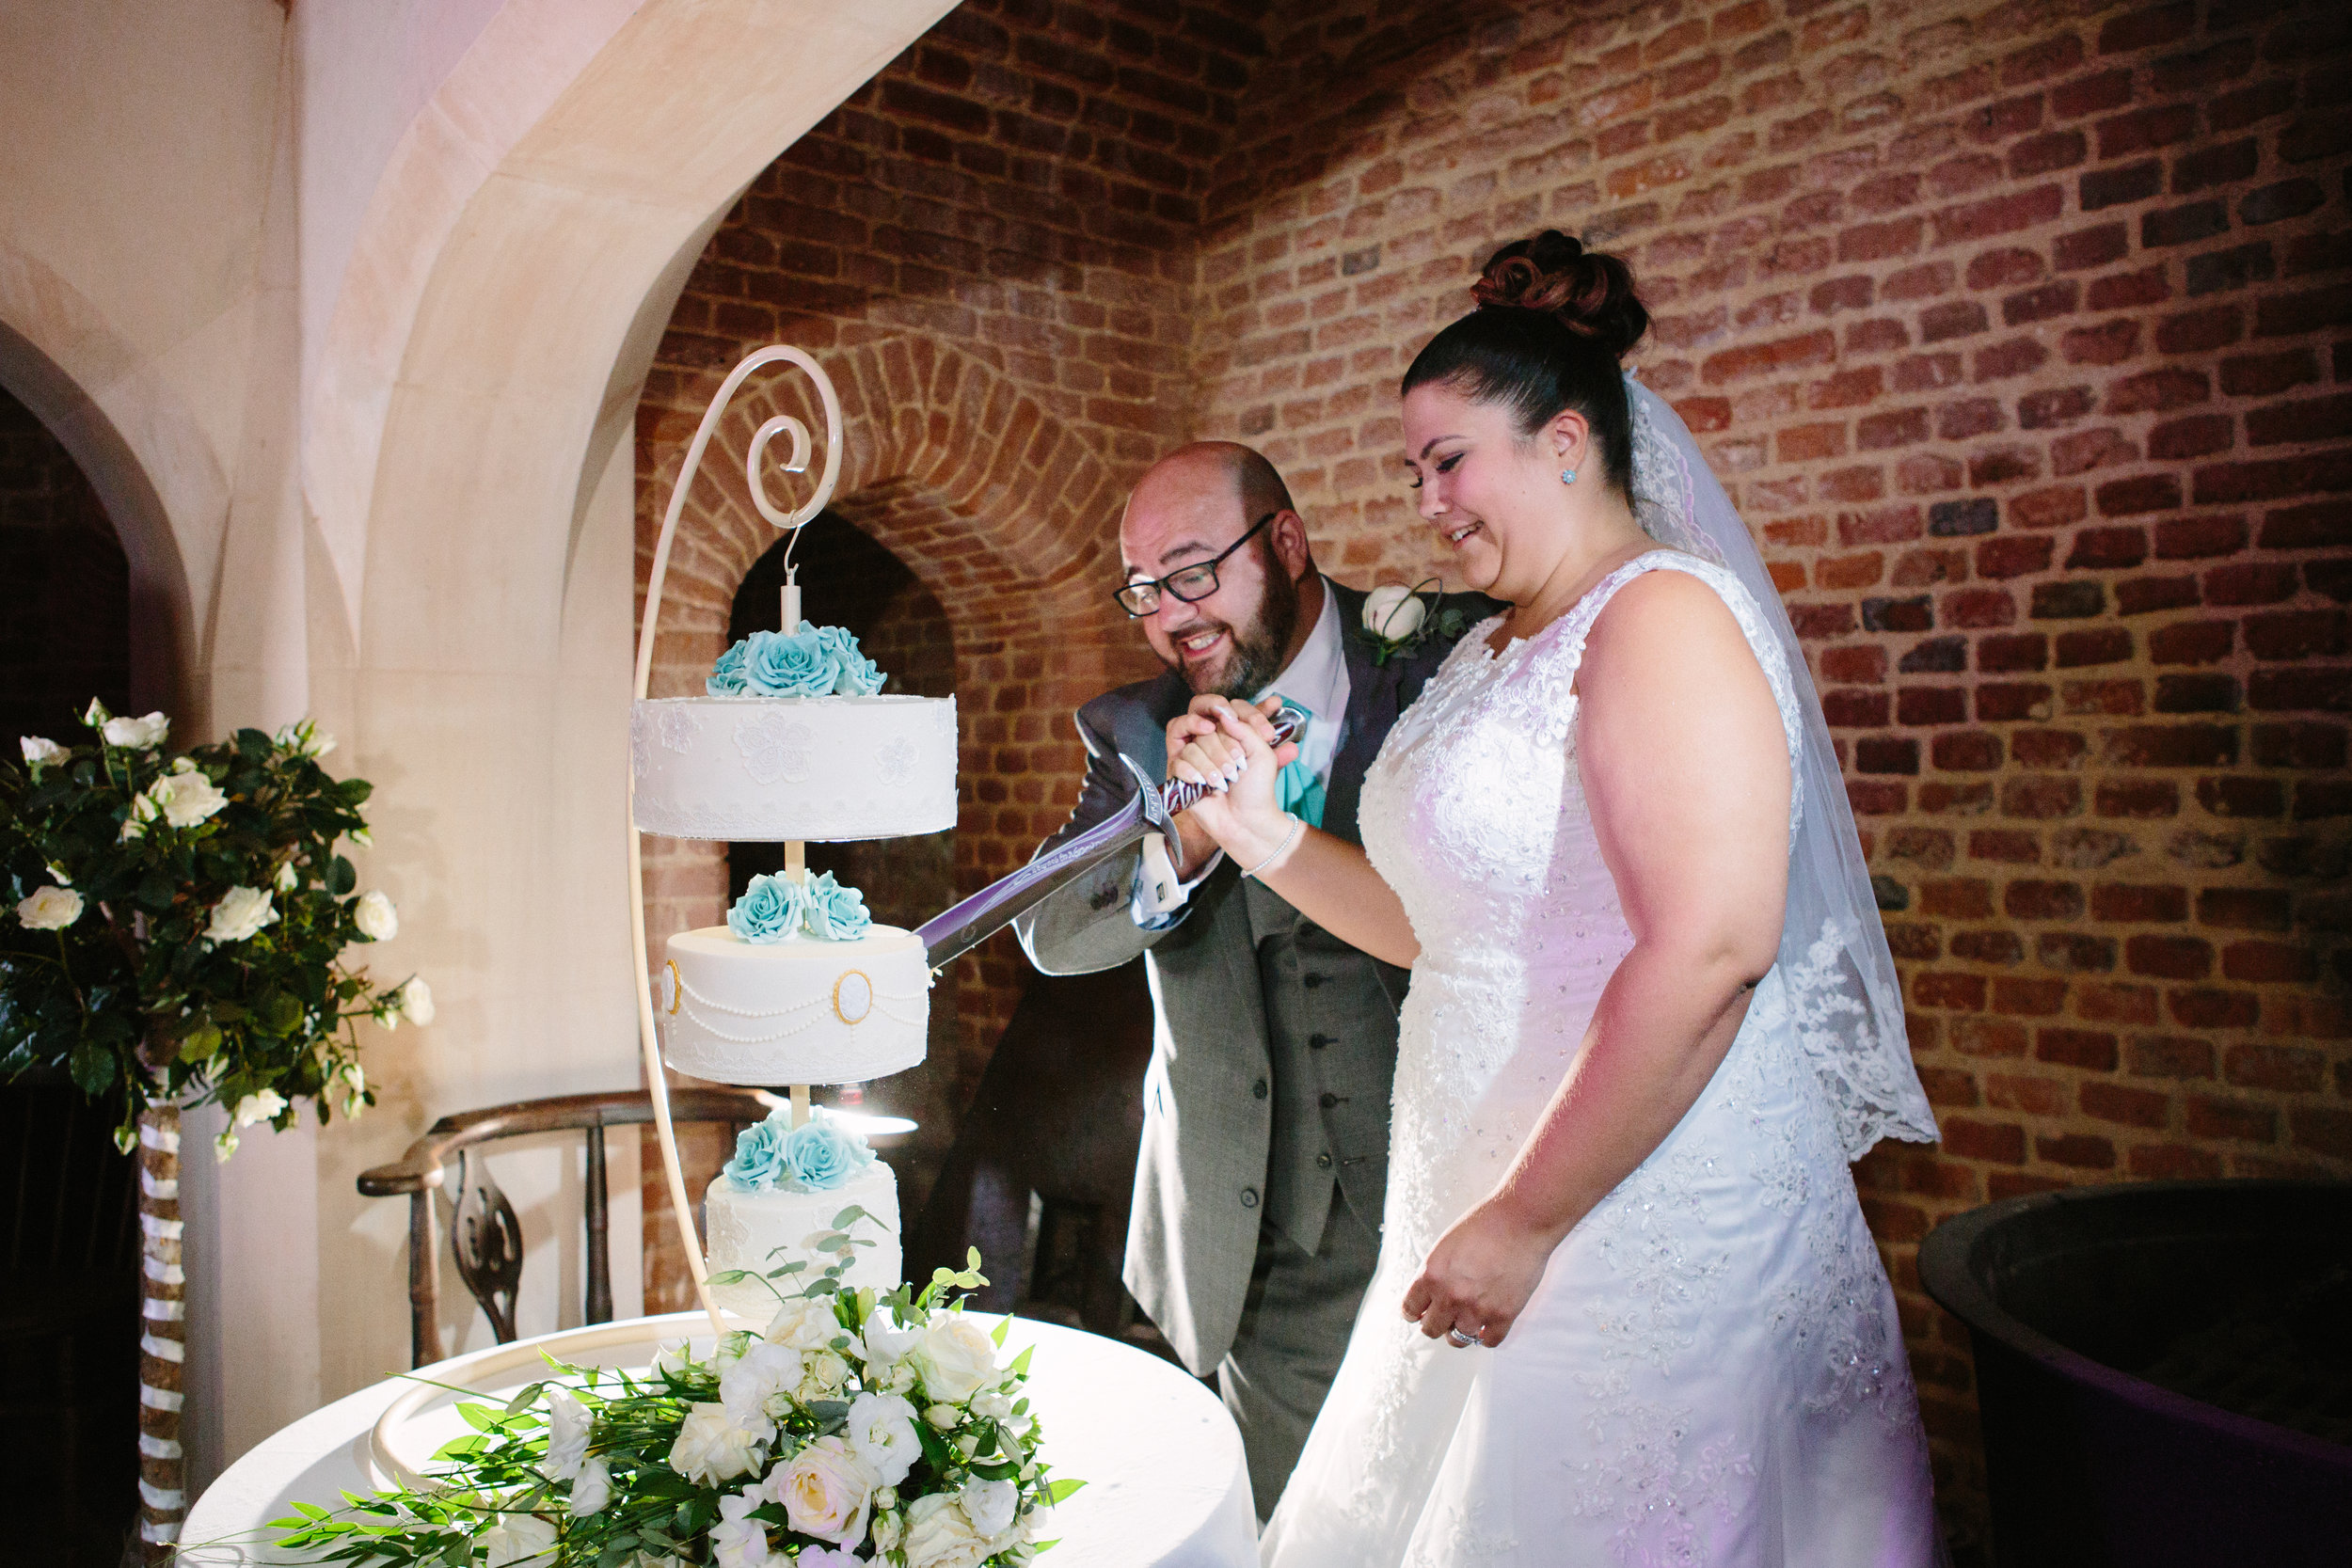 westenhangar-castle-kent-london-wedding-photography-cake-66